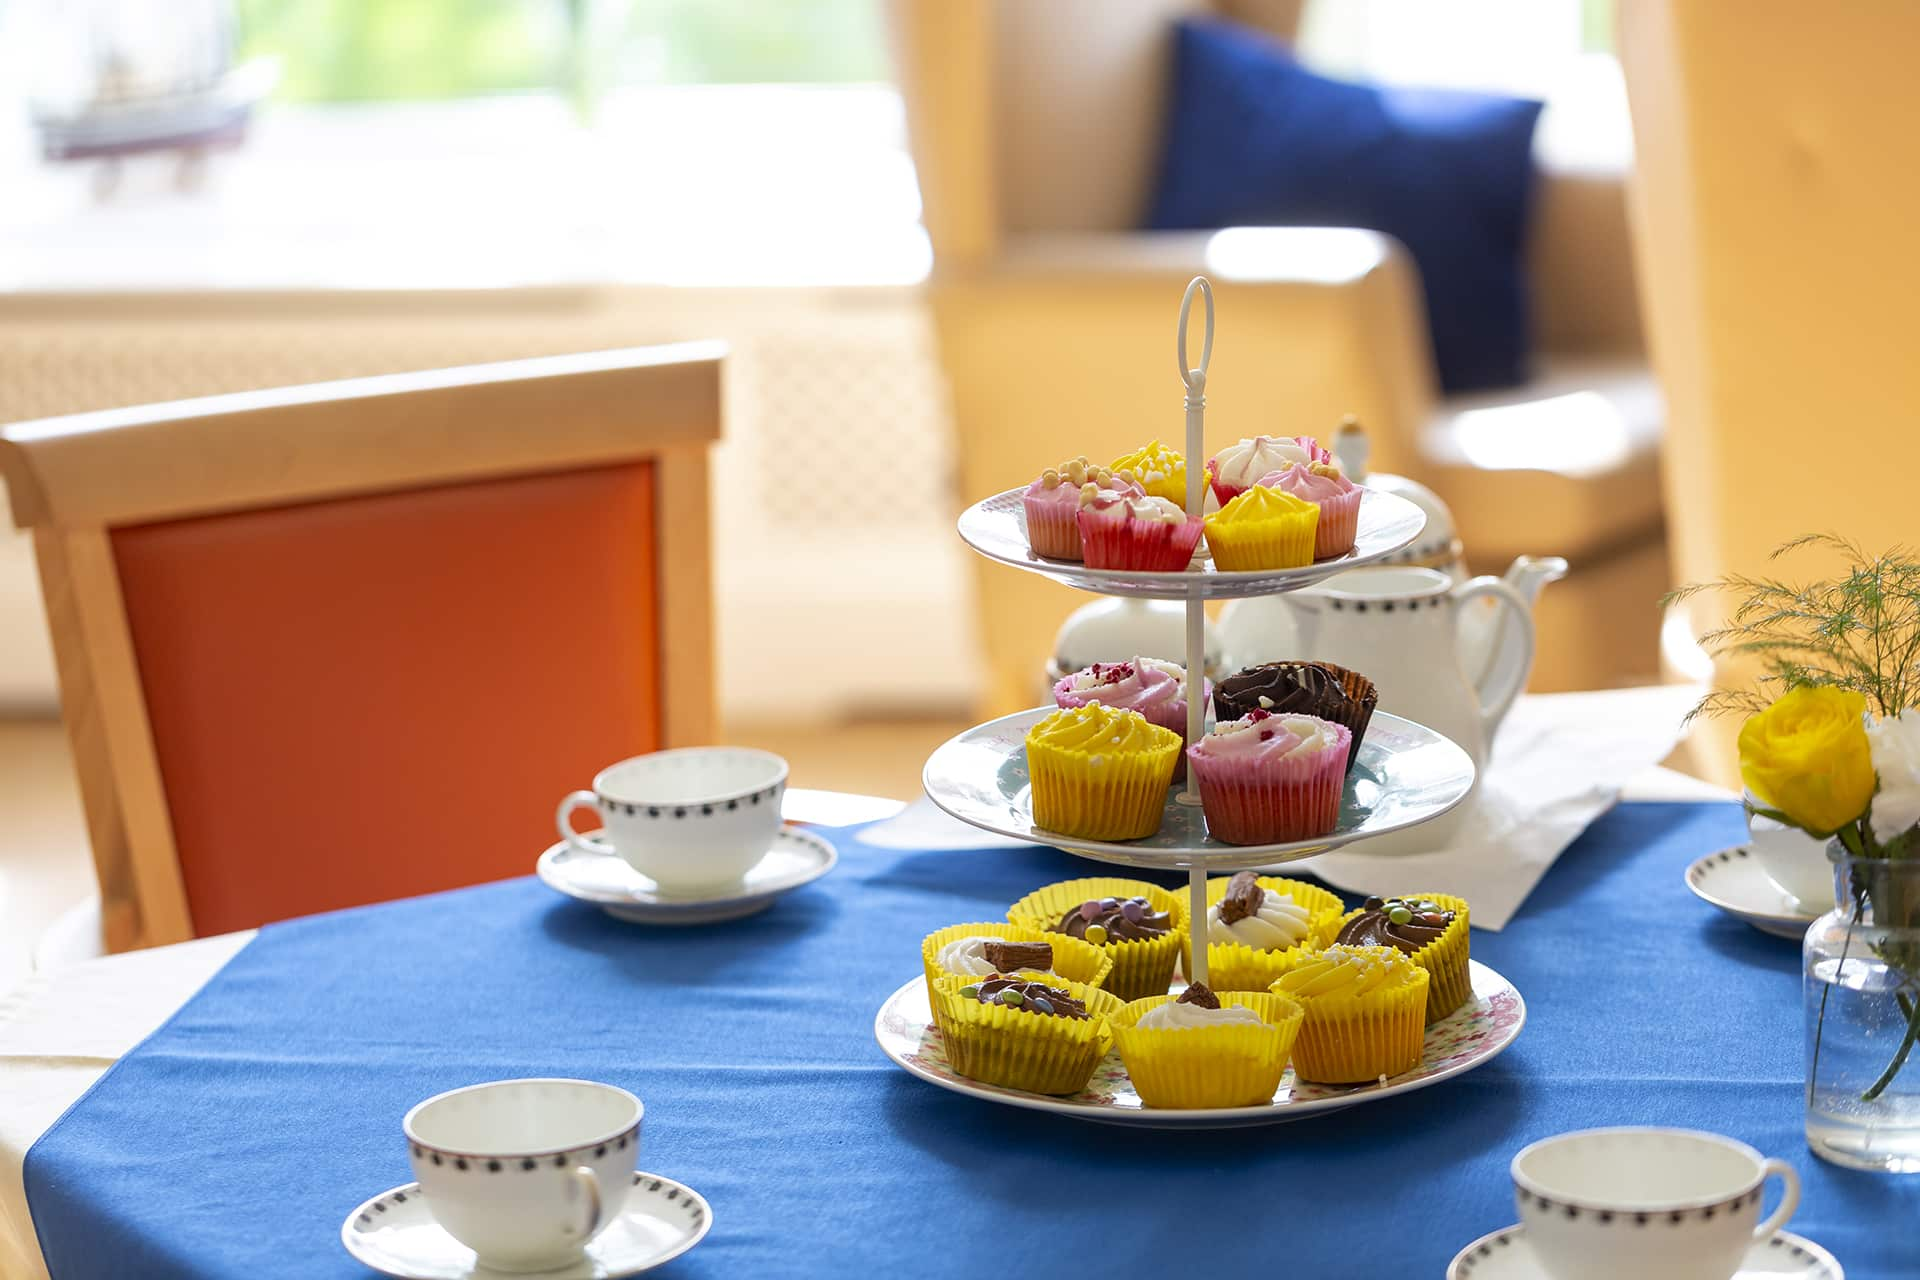 Stambridge Meadows Care Home afternoon tea cakes